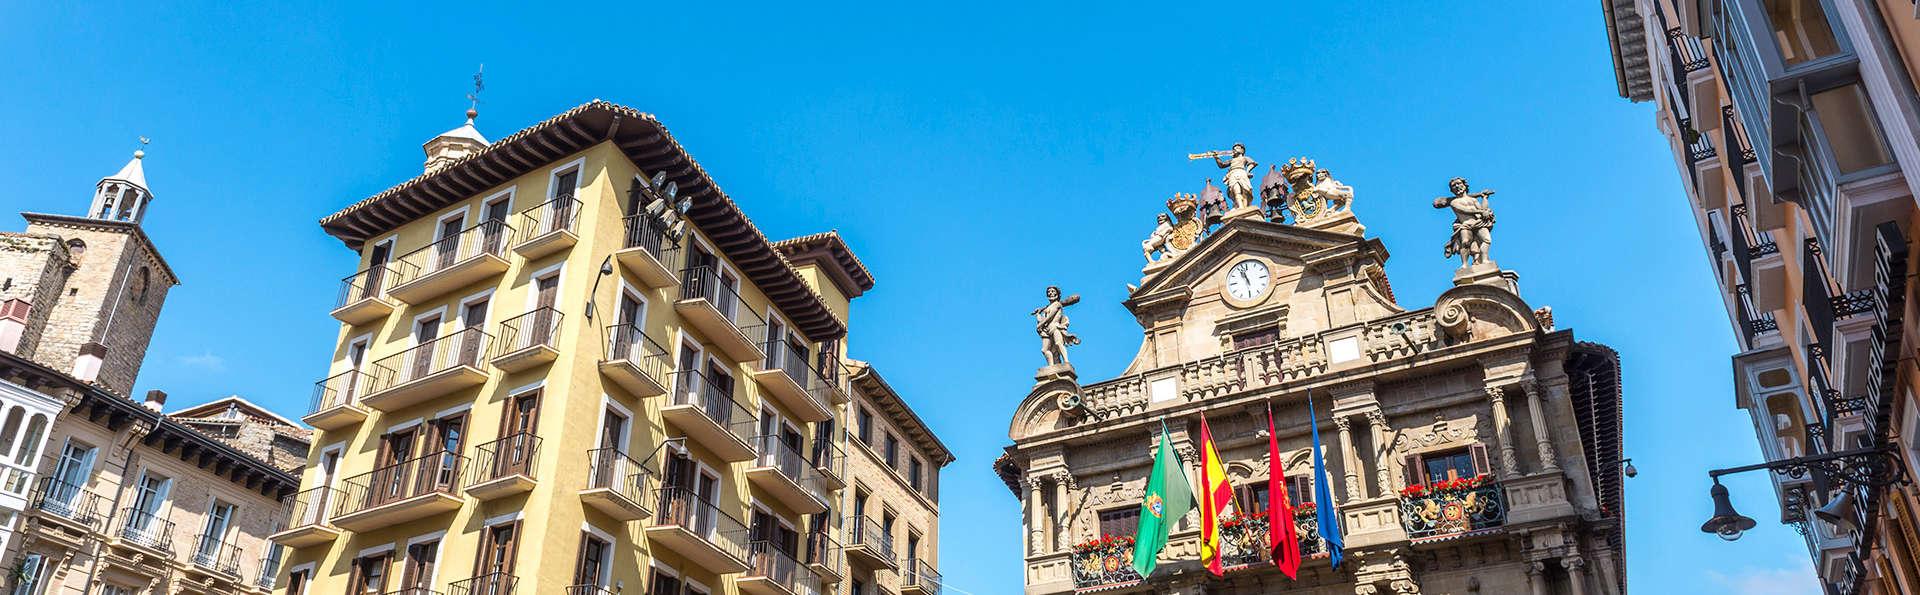 Hotel Bed4U Pamplona - EDIT_destination2.jpg